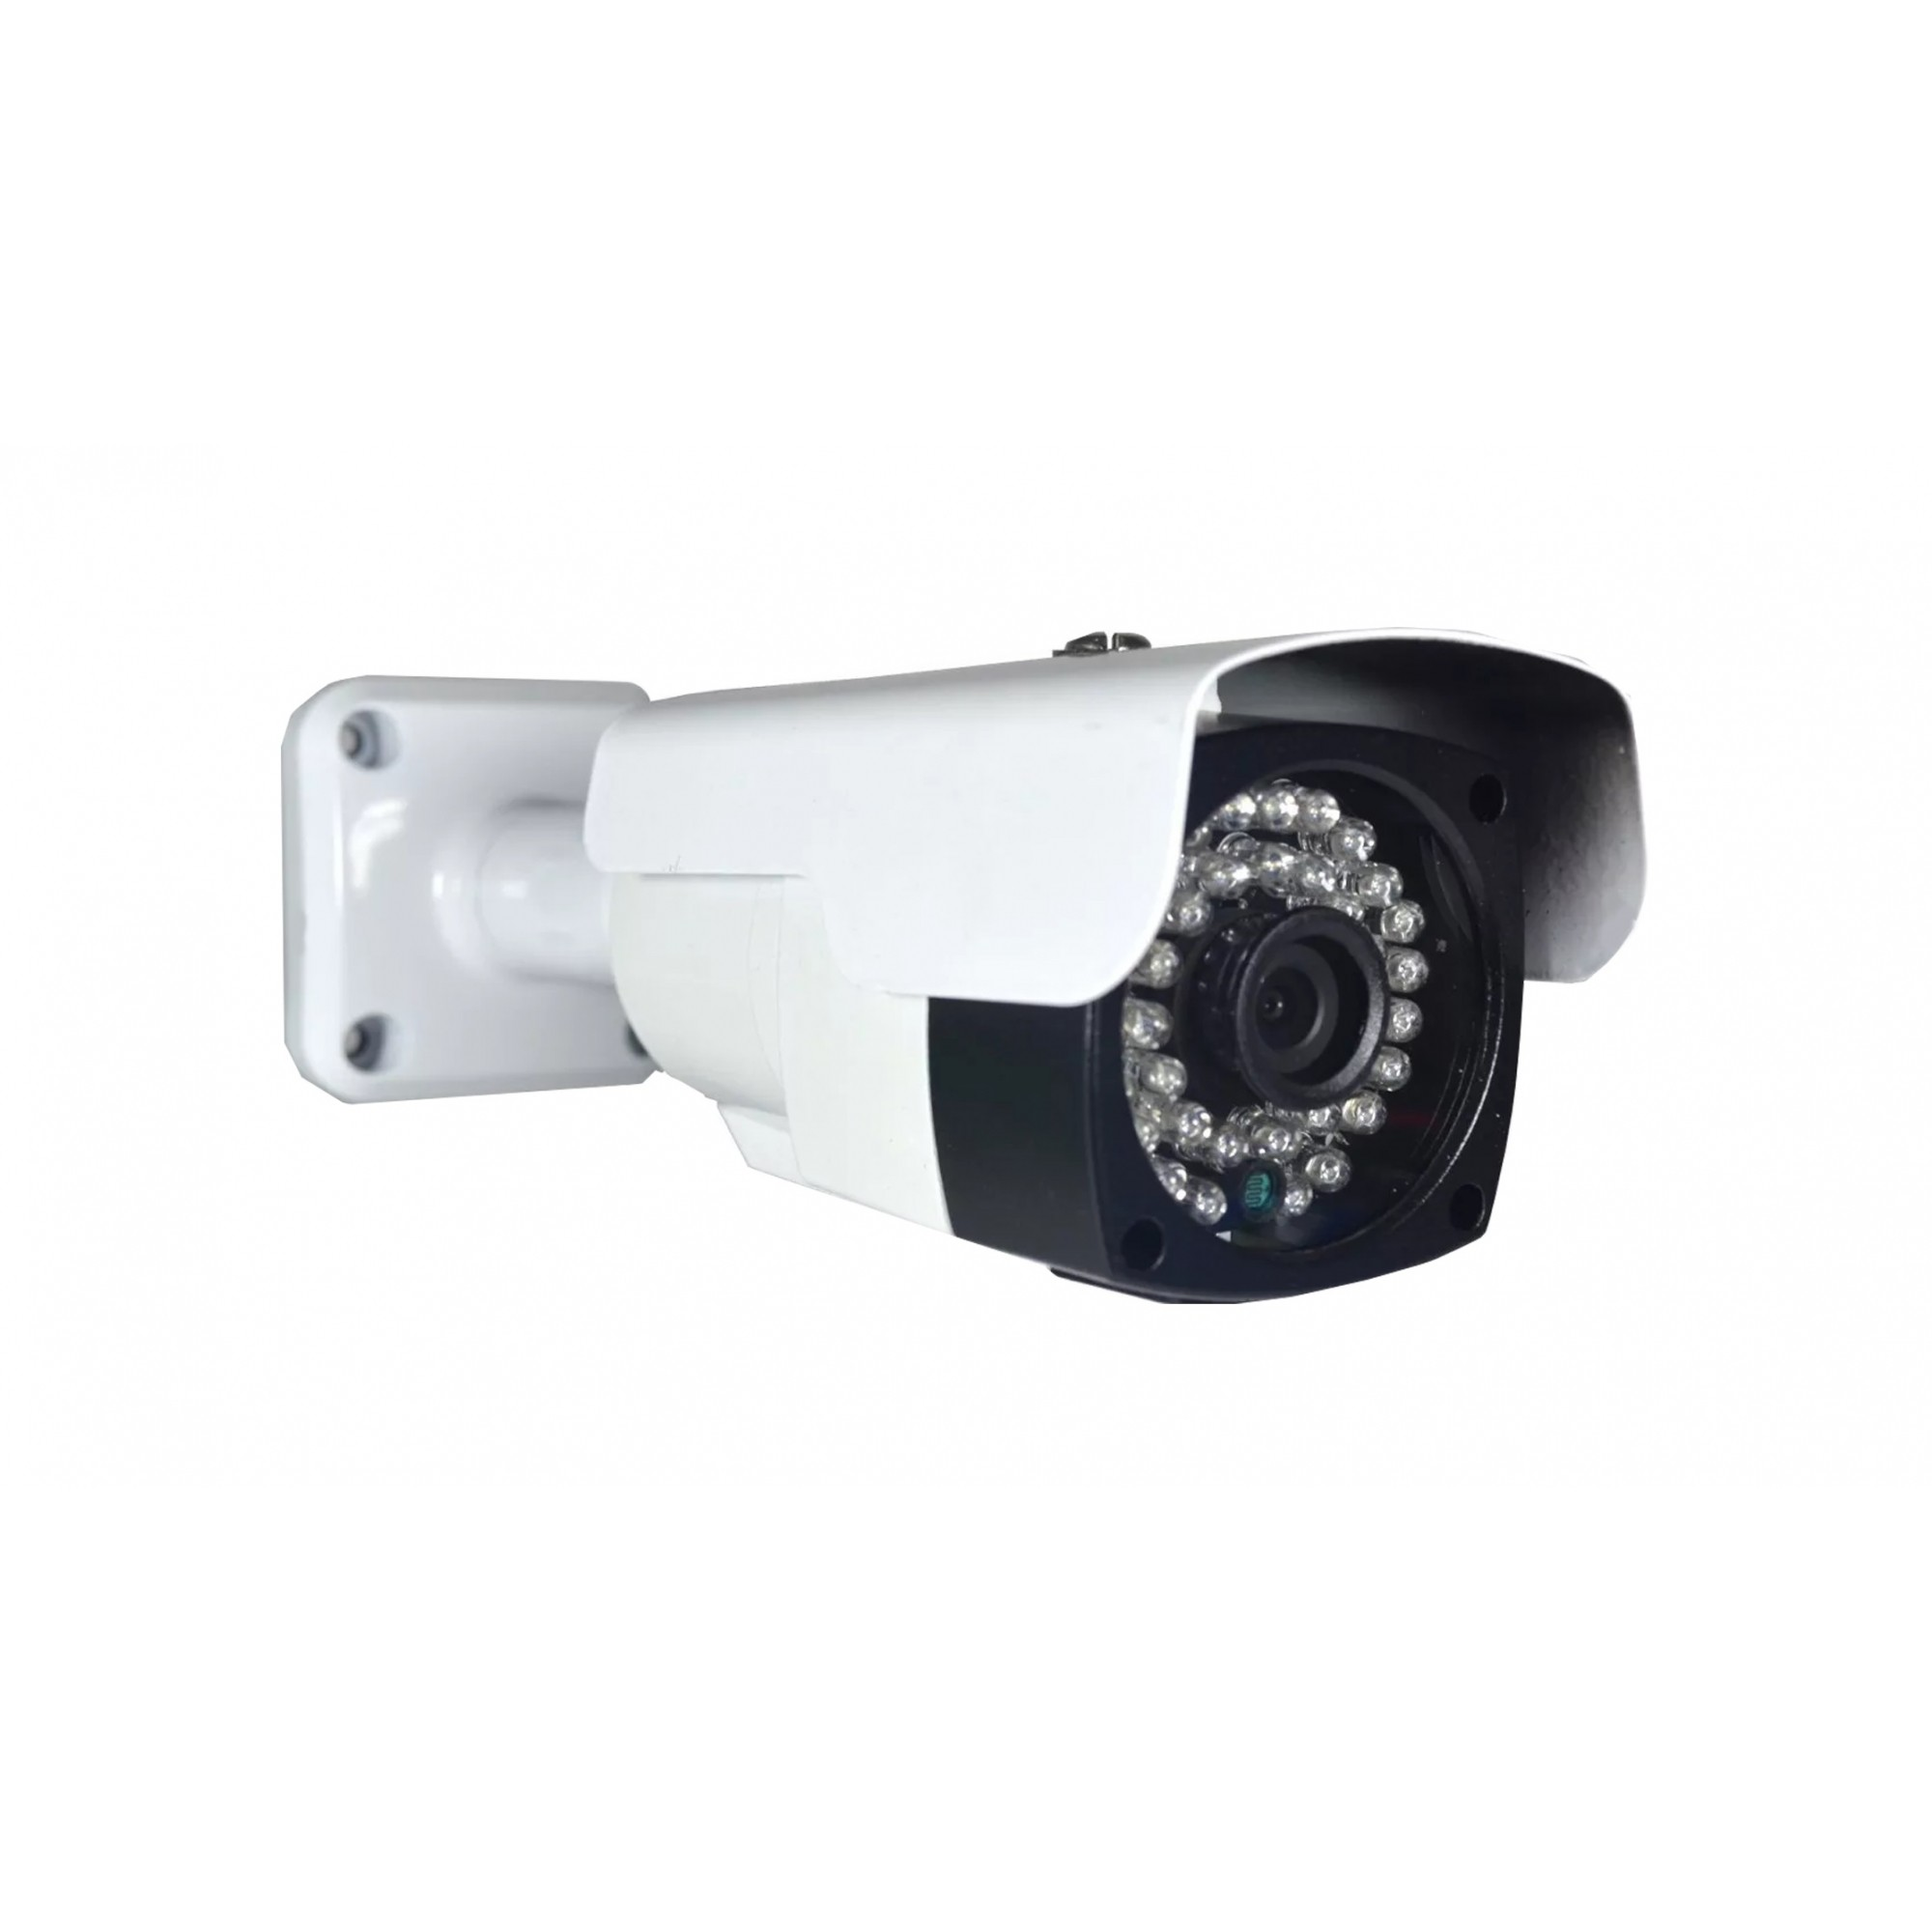 Kit Cftv 2 Câmeras AHD-M 2.0MP 720p 3,6mm DVR 4 Canais Newprotec + HD 250GB